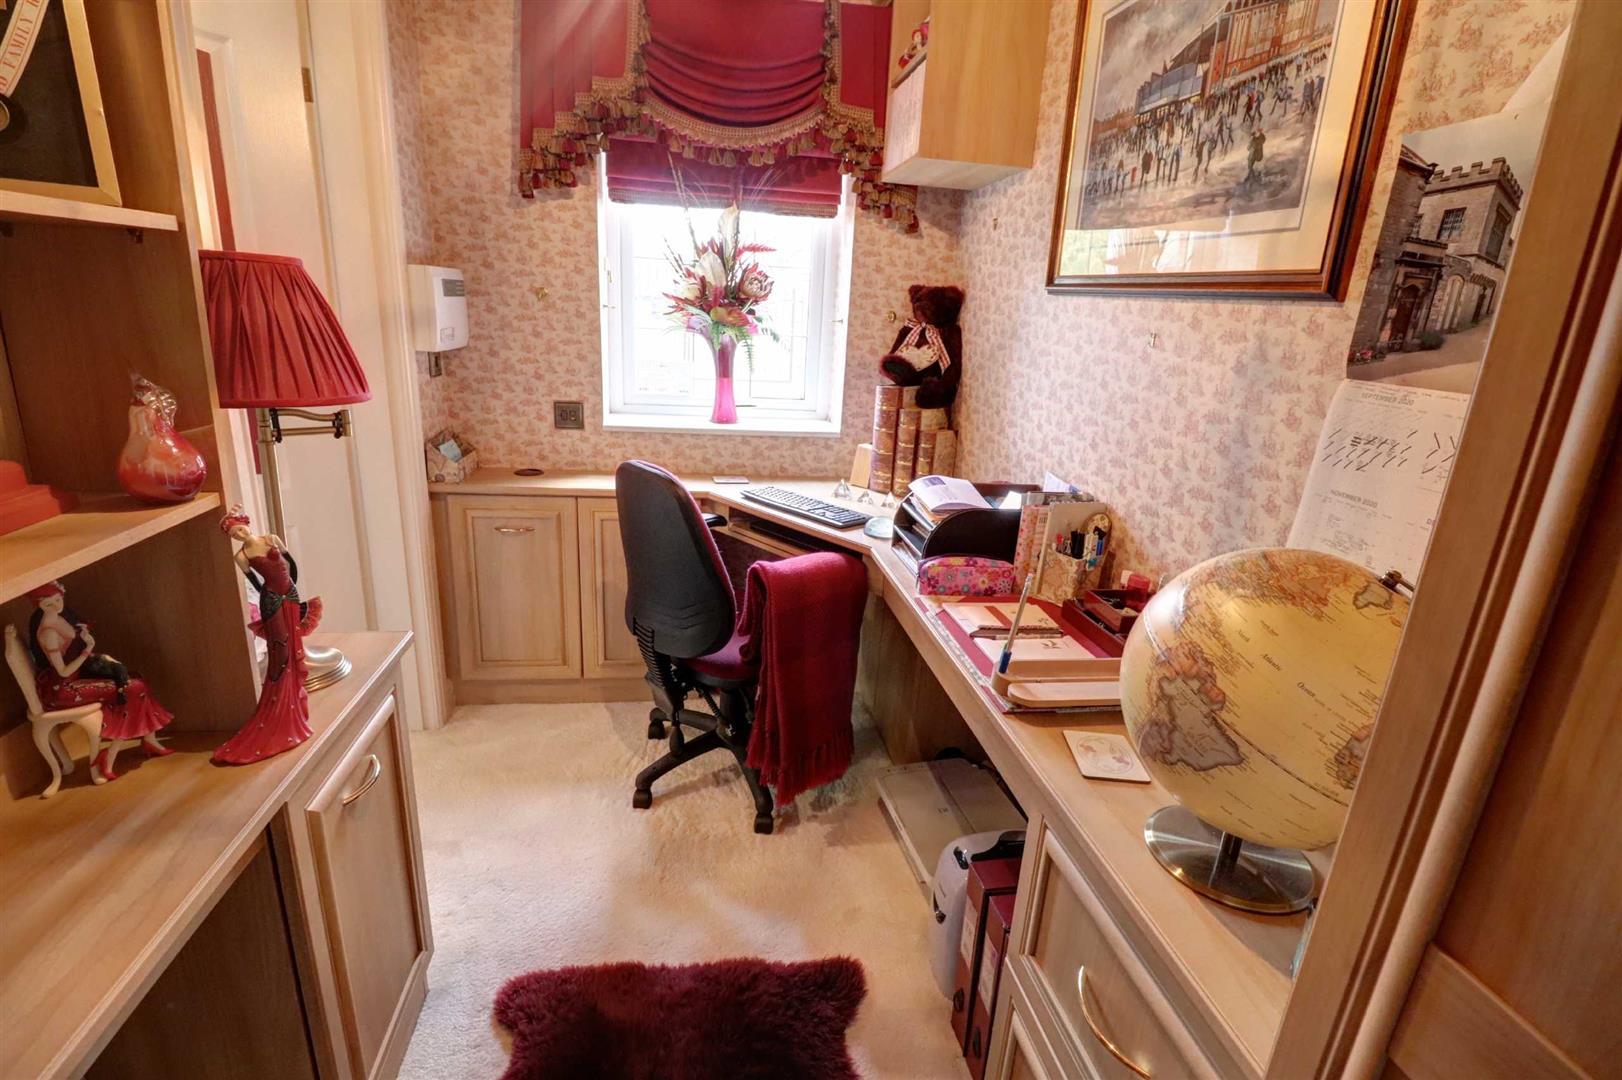 3 Bedroom Detached House For Sale - Image 9